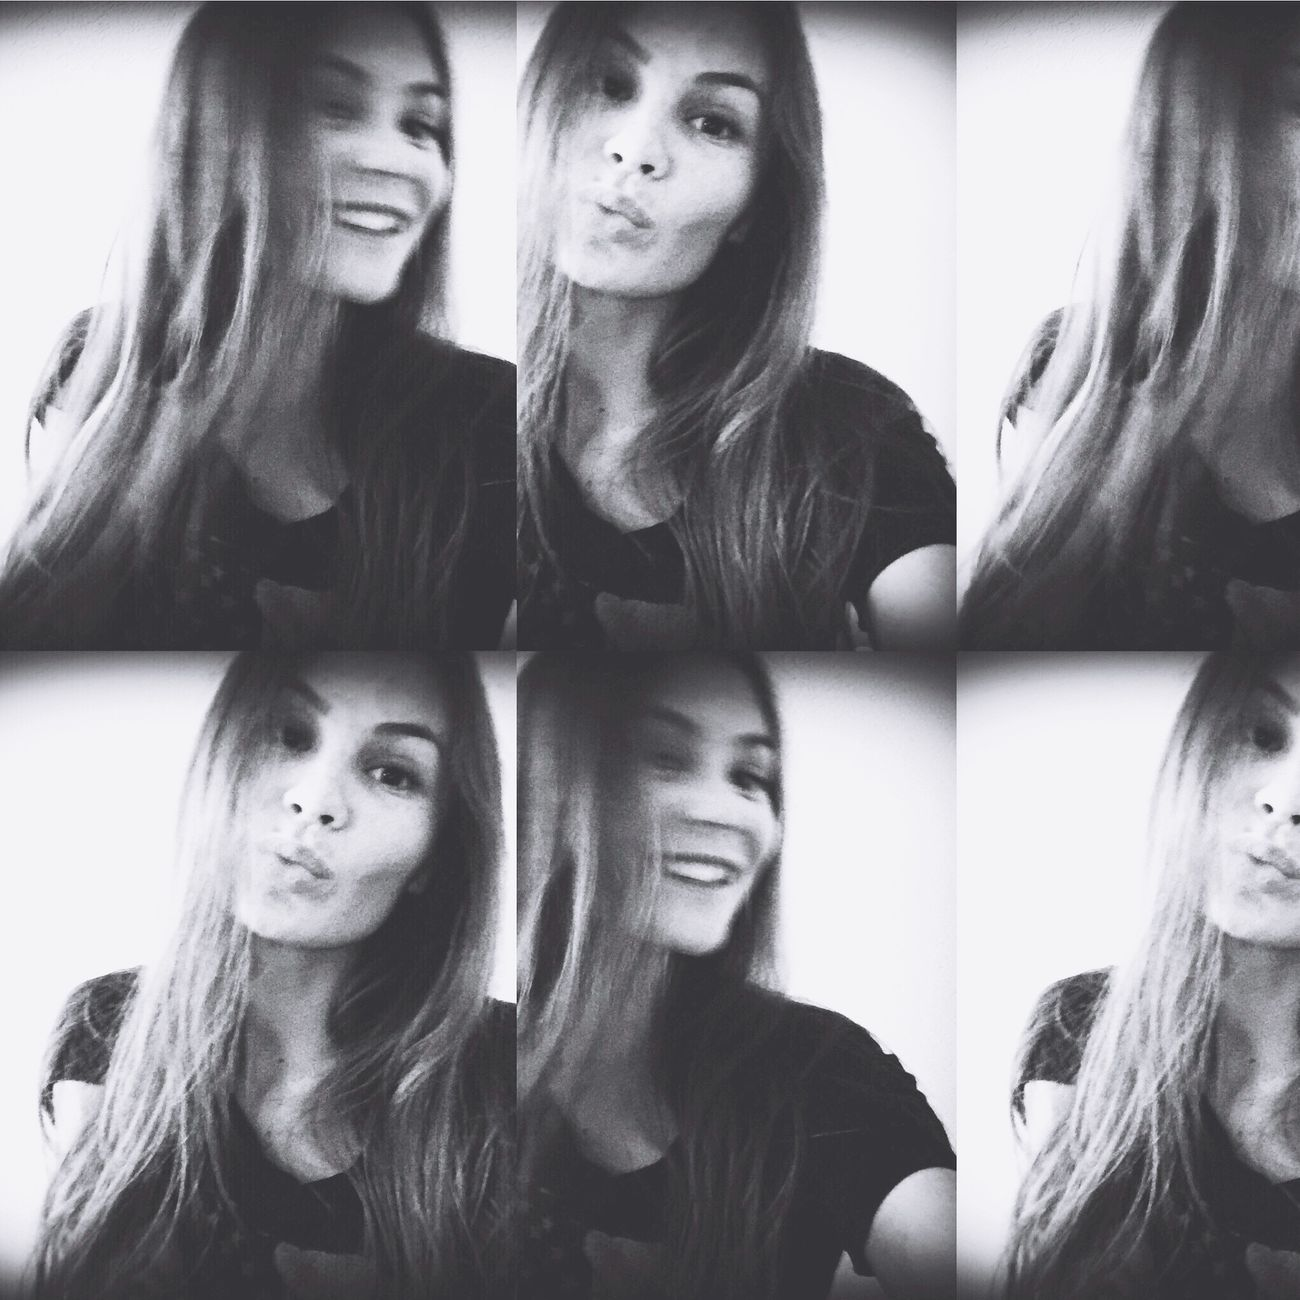 Blackandwhite Photo Selfie Selfierussia Goodday Smile Happy